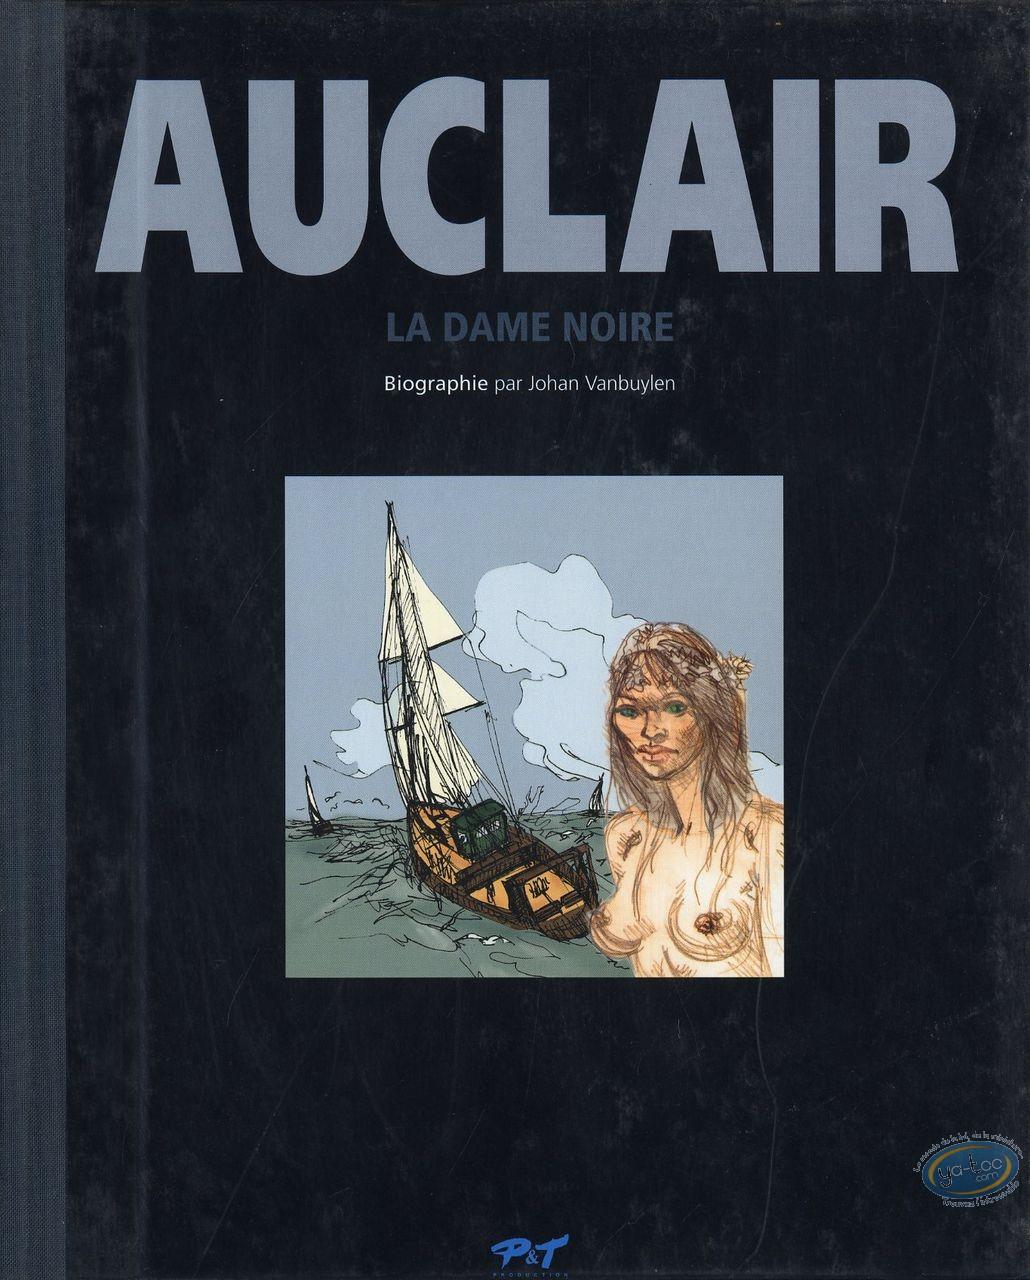 Reduced price European comic books, Dame Noire (La) : Biographie 'La ballade de cheveu-rouge' La dame Noire